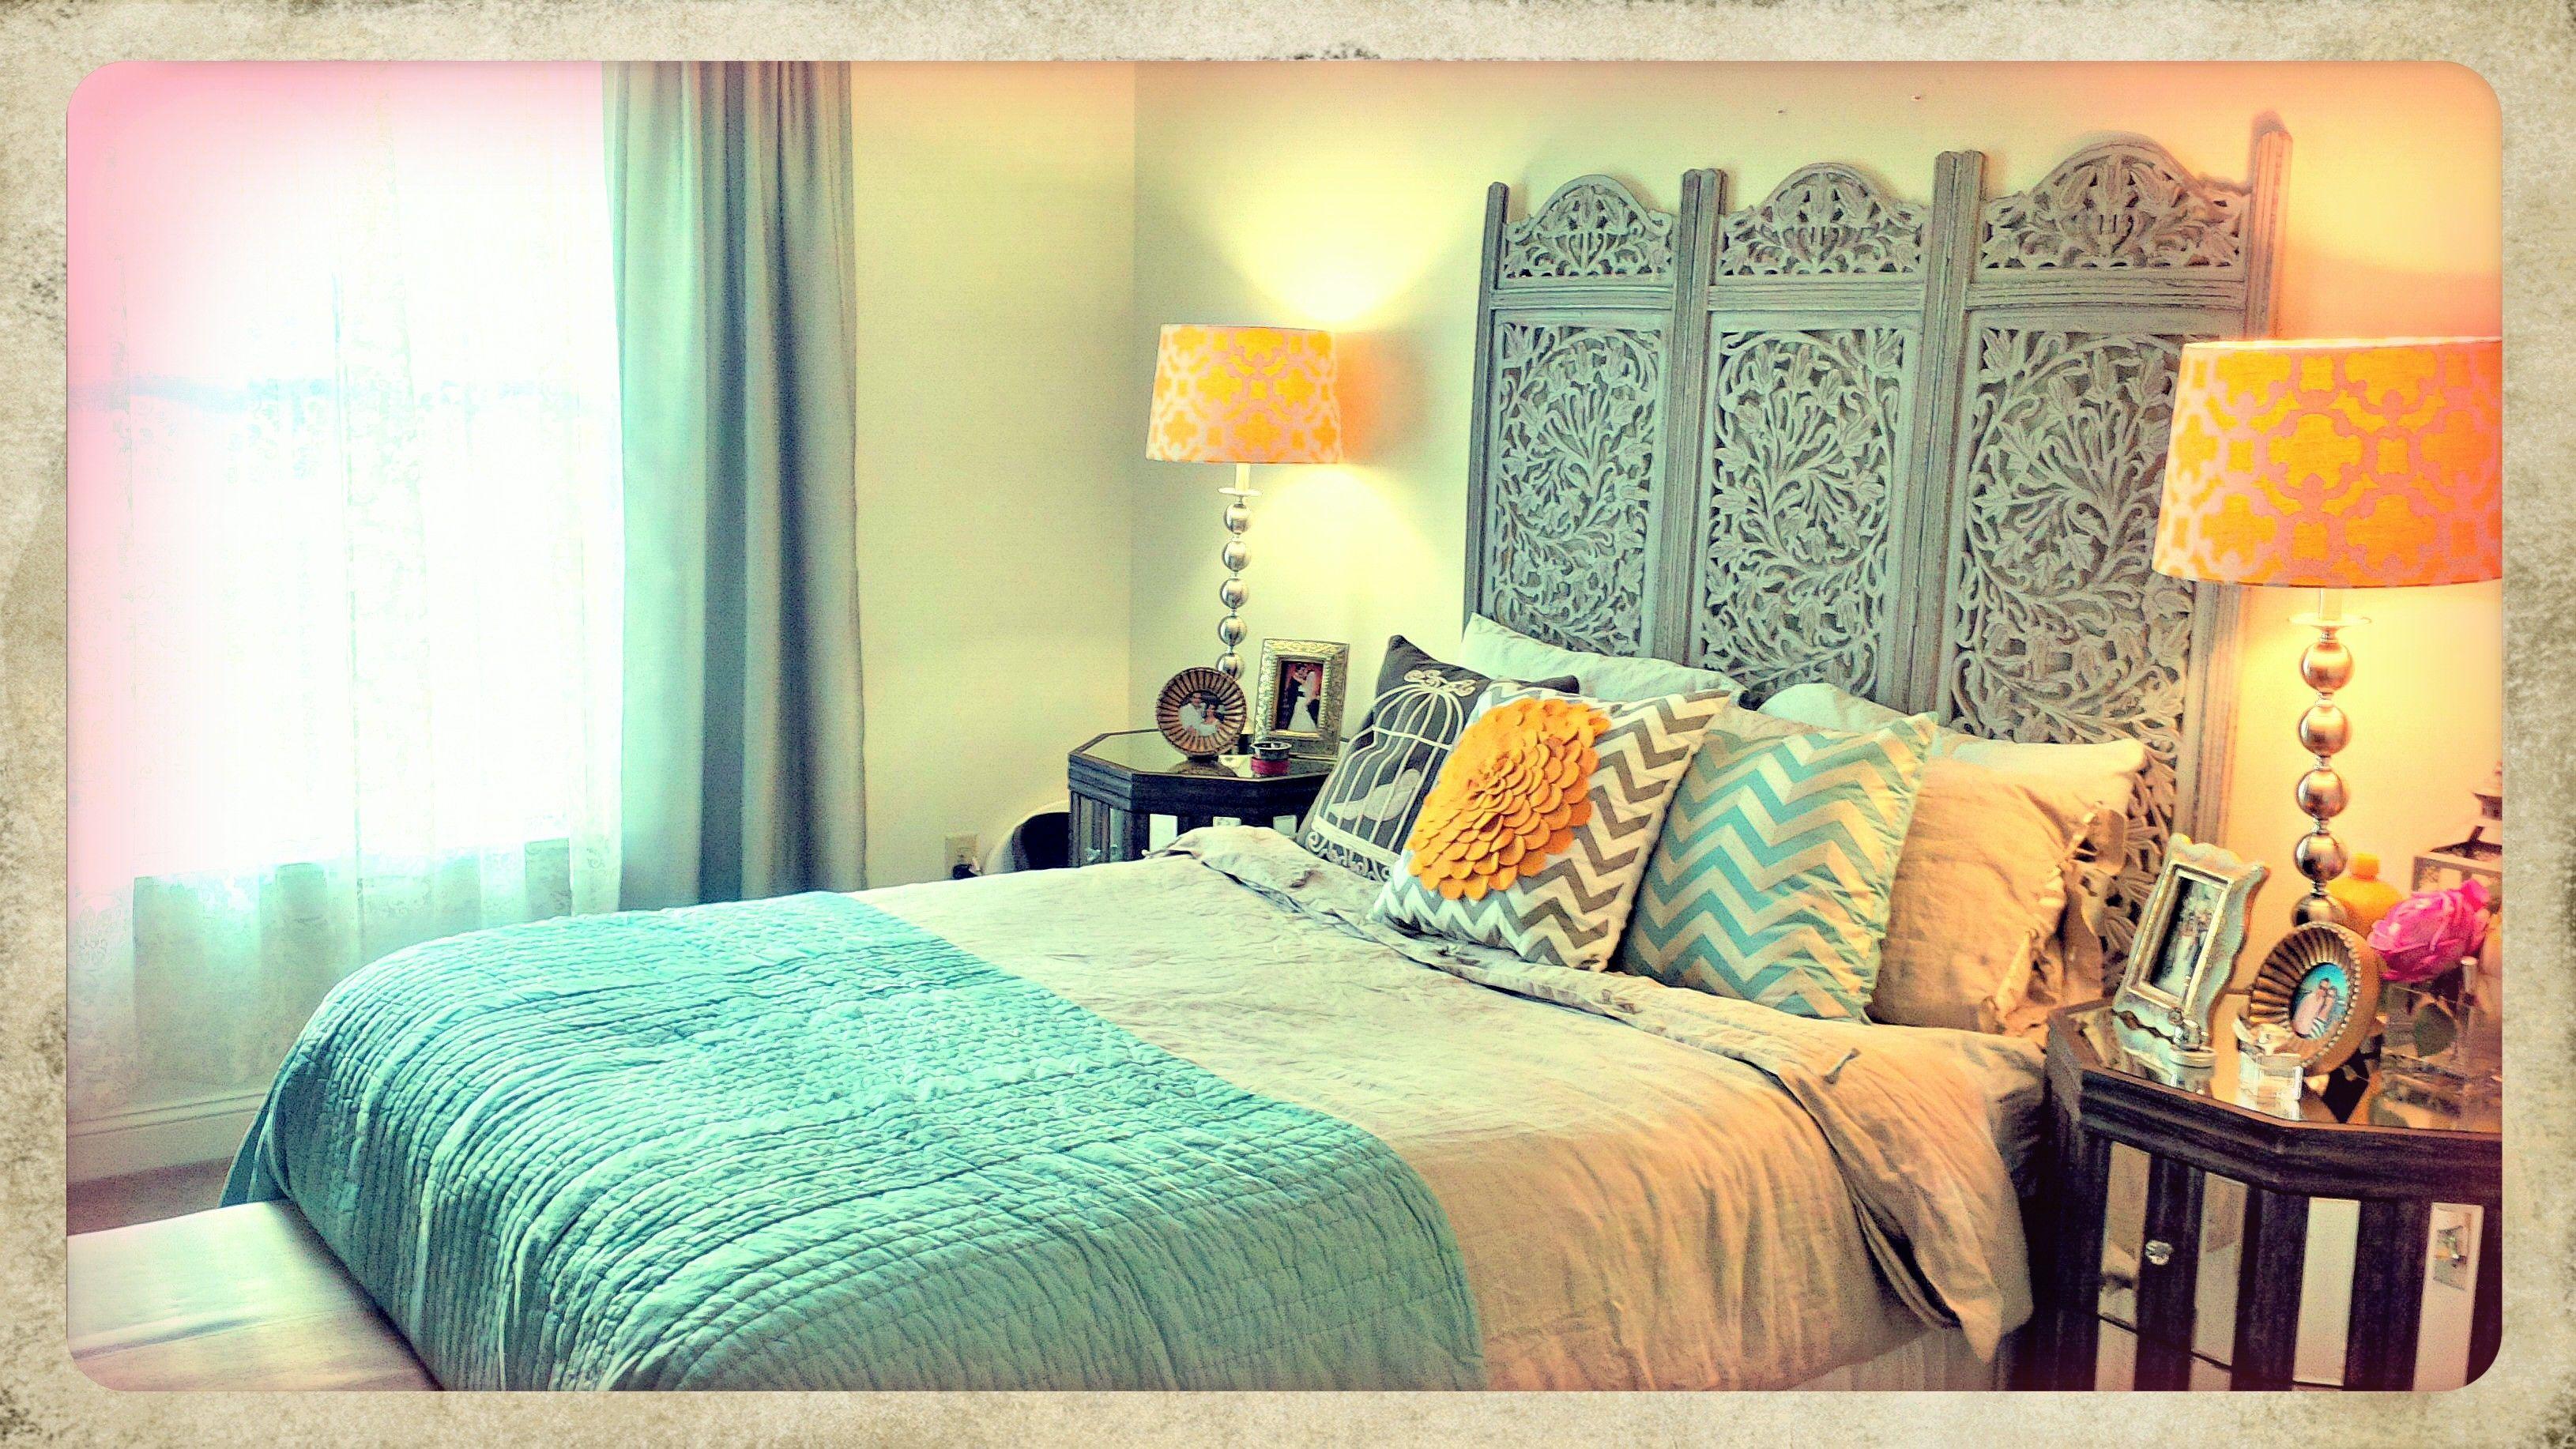 Love the headboard idea #bedroom_decor #interior_design bedrooms-i ...